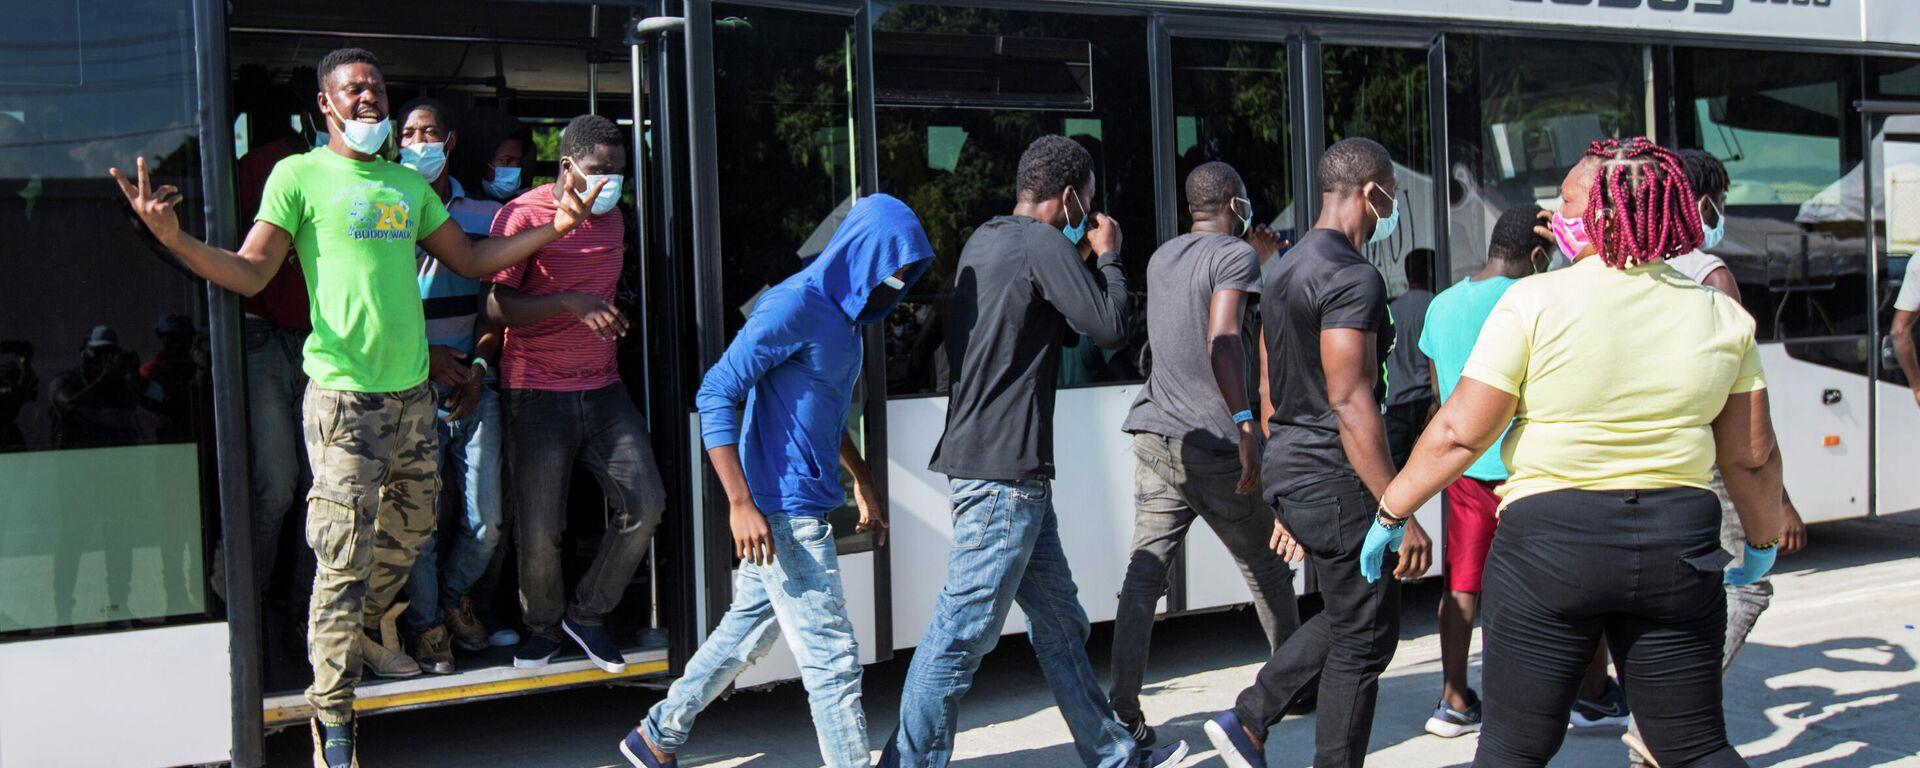 Migrantes haitianos a su llegada a Puerto Príncipe, Haití - Sputnik Mundo, 1920, 24.09.2021